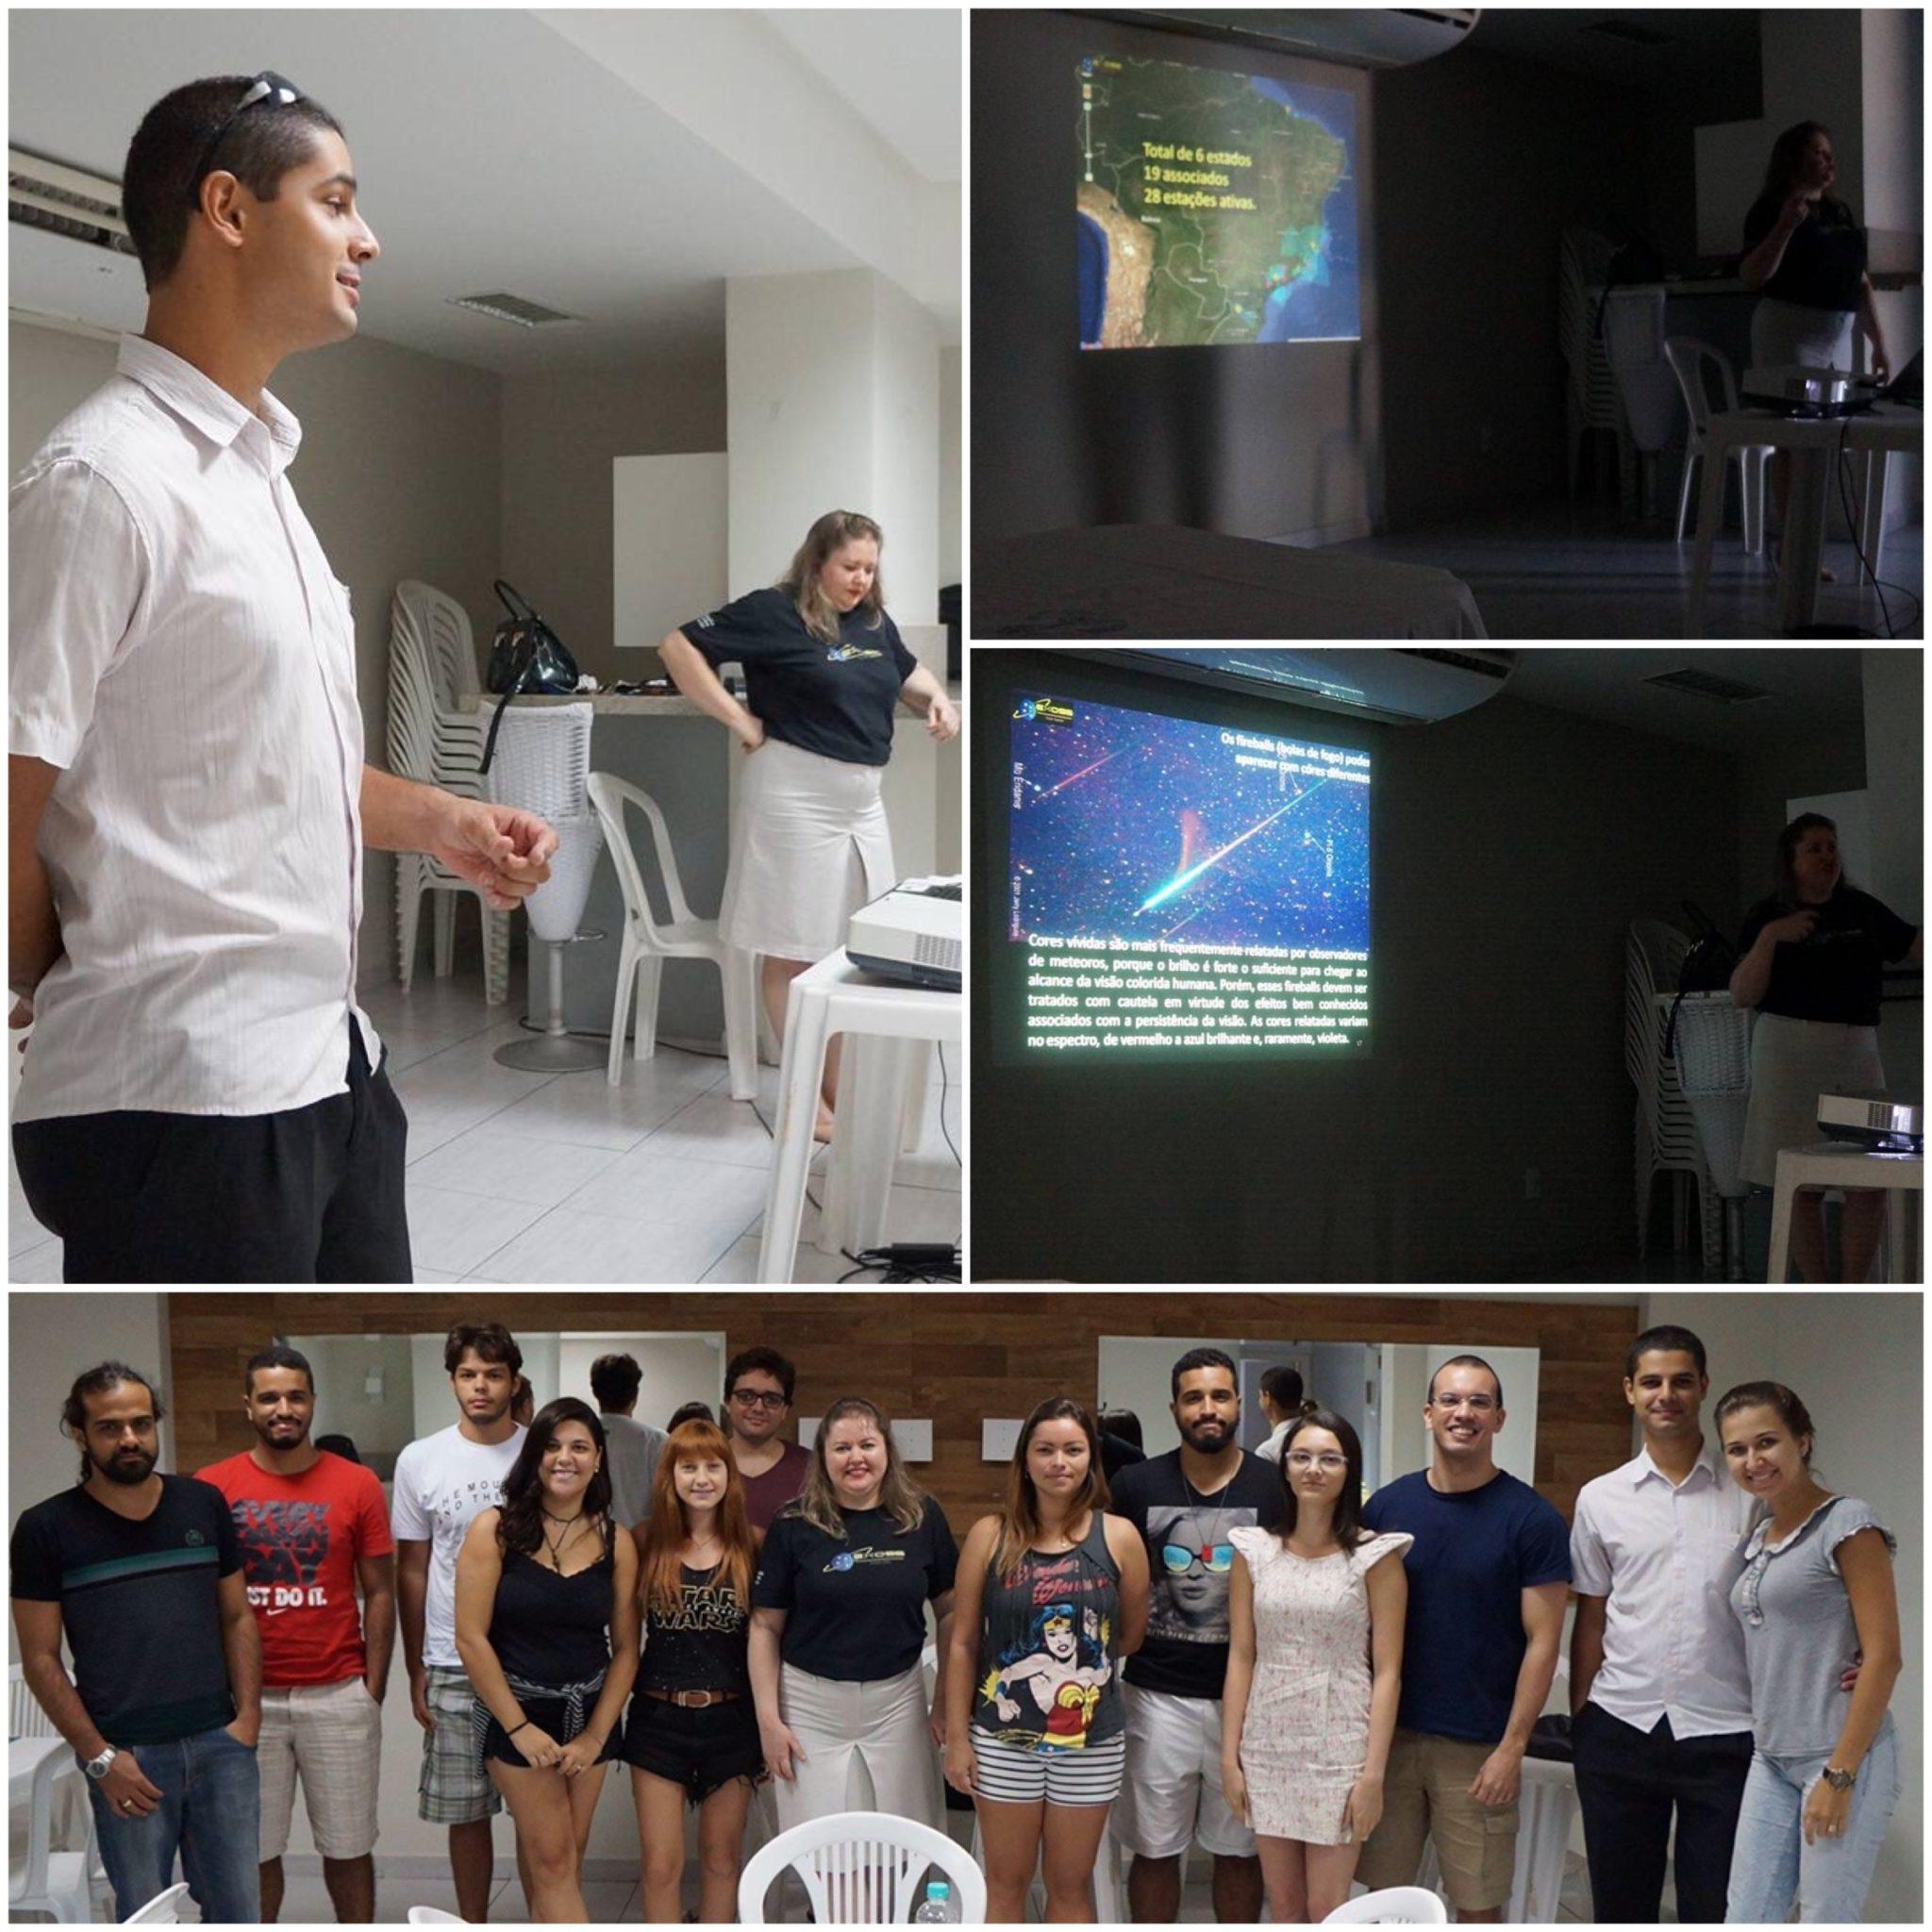 palestra exoss no clube astronomia do es